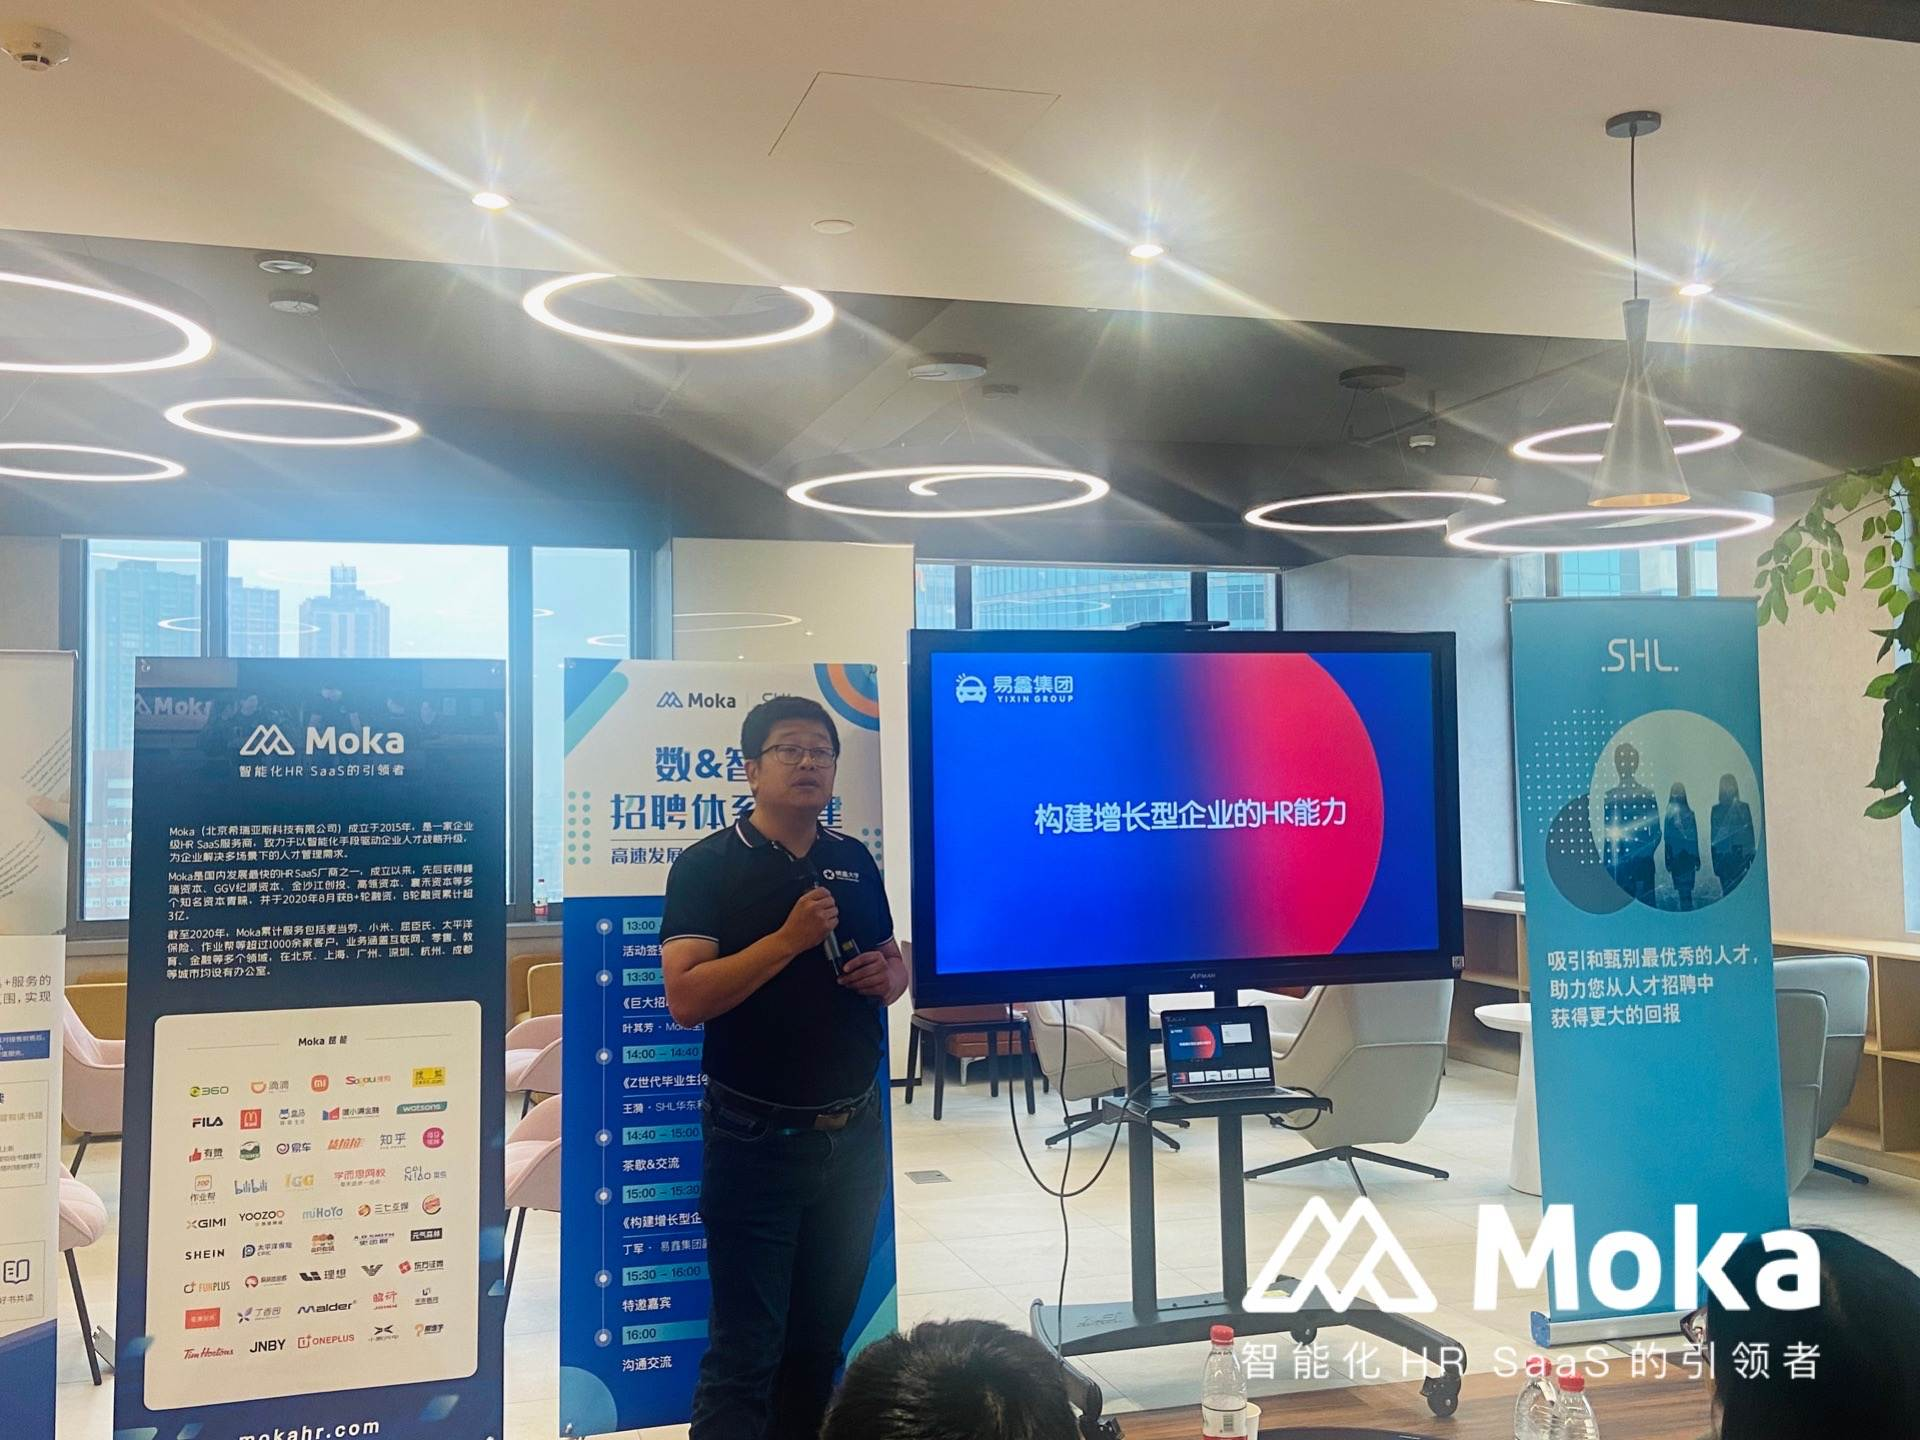 Moka&SHL联合沙龙,探讨高速发展企业招聘破局之道-Moka智能化招聘系统